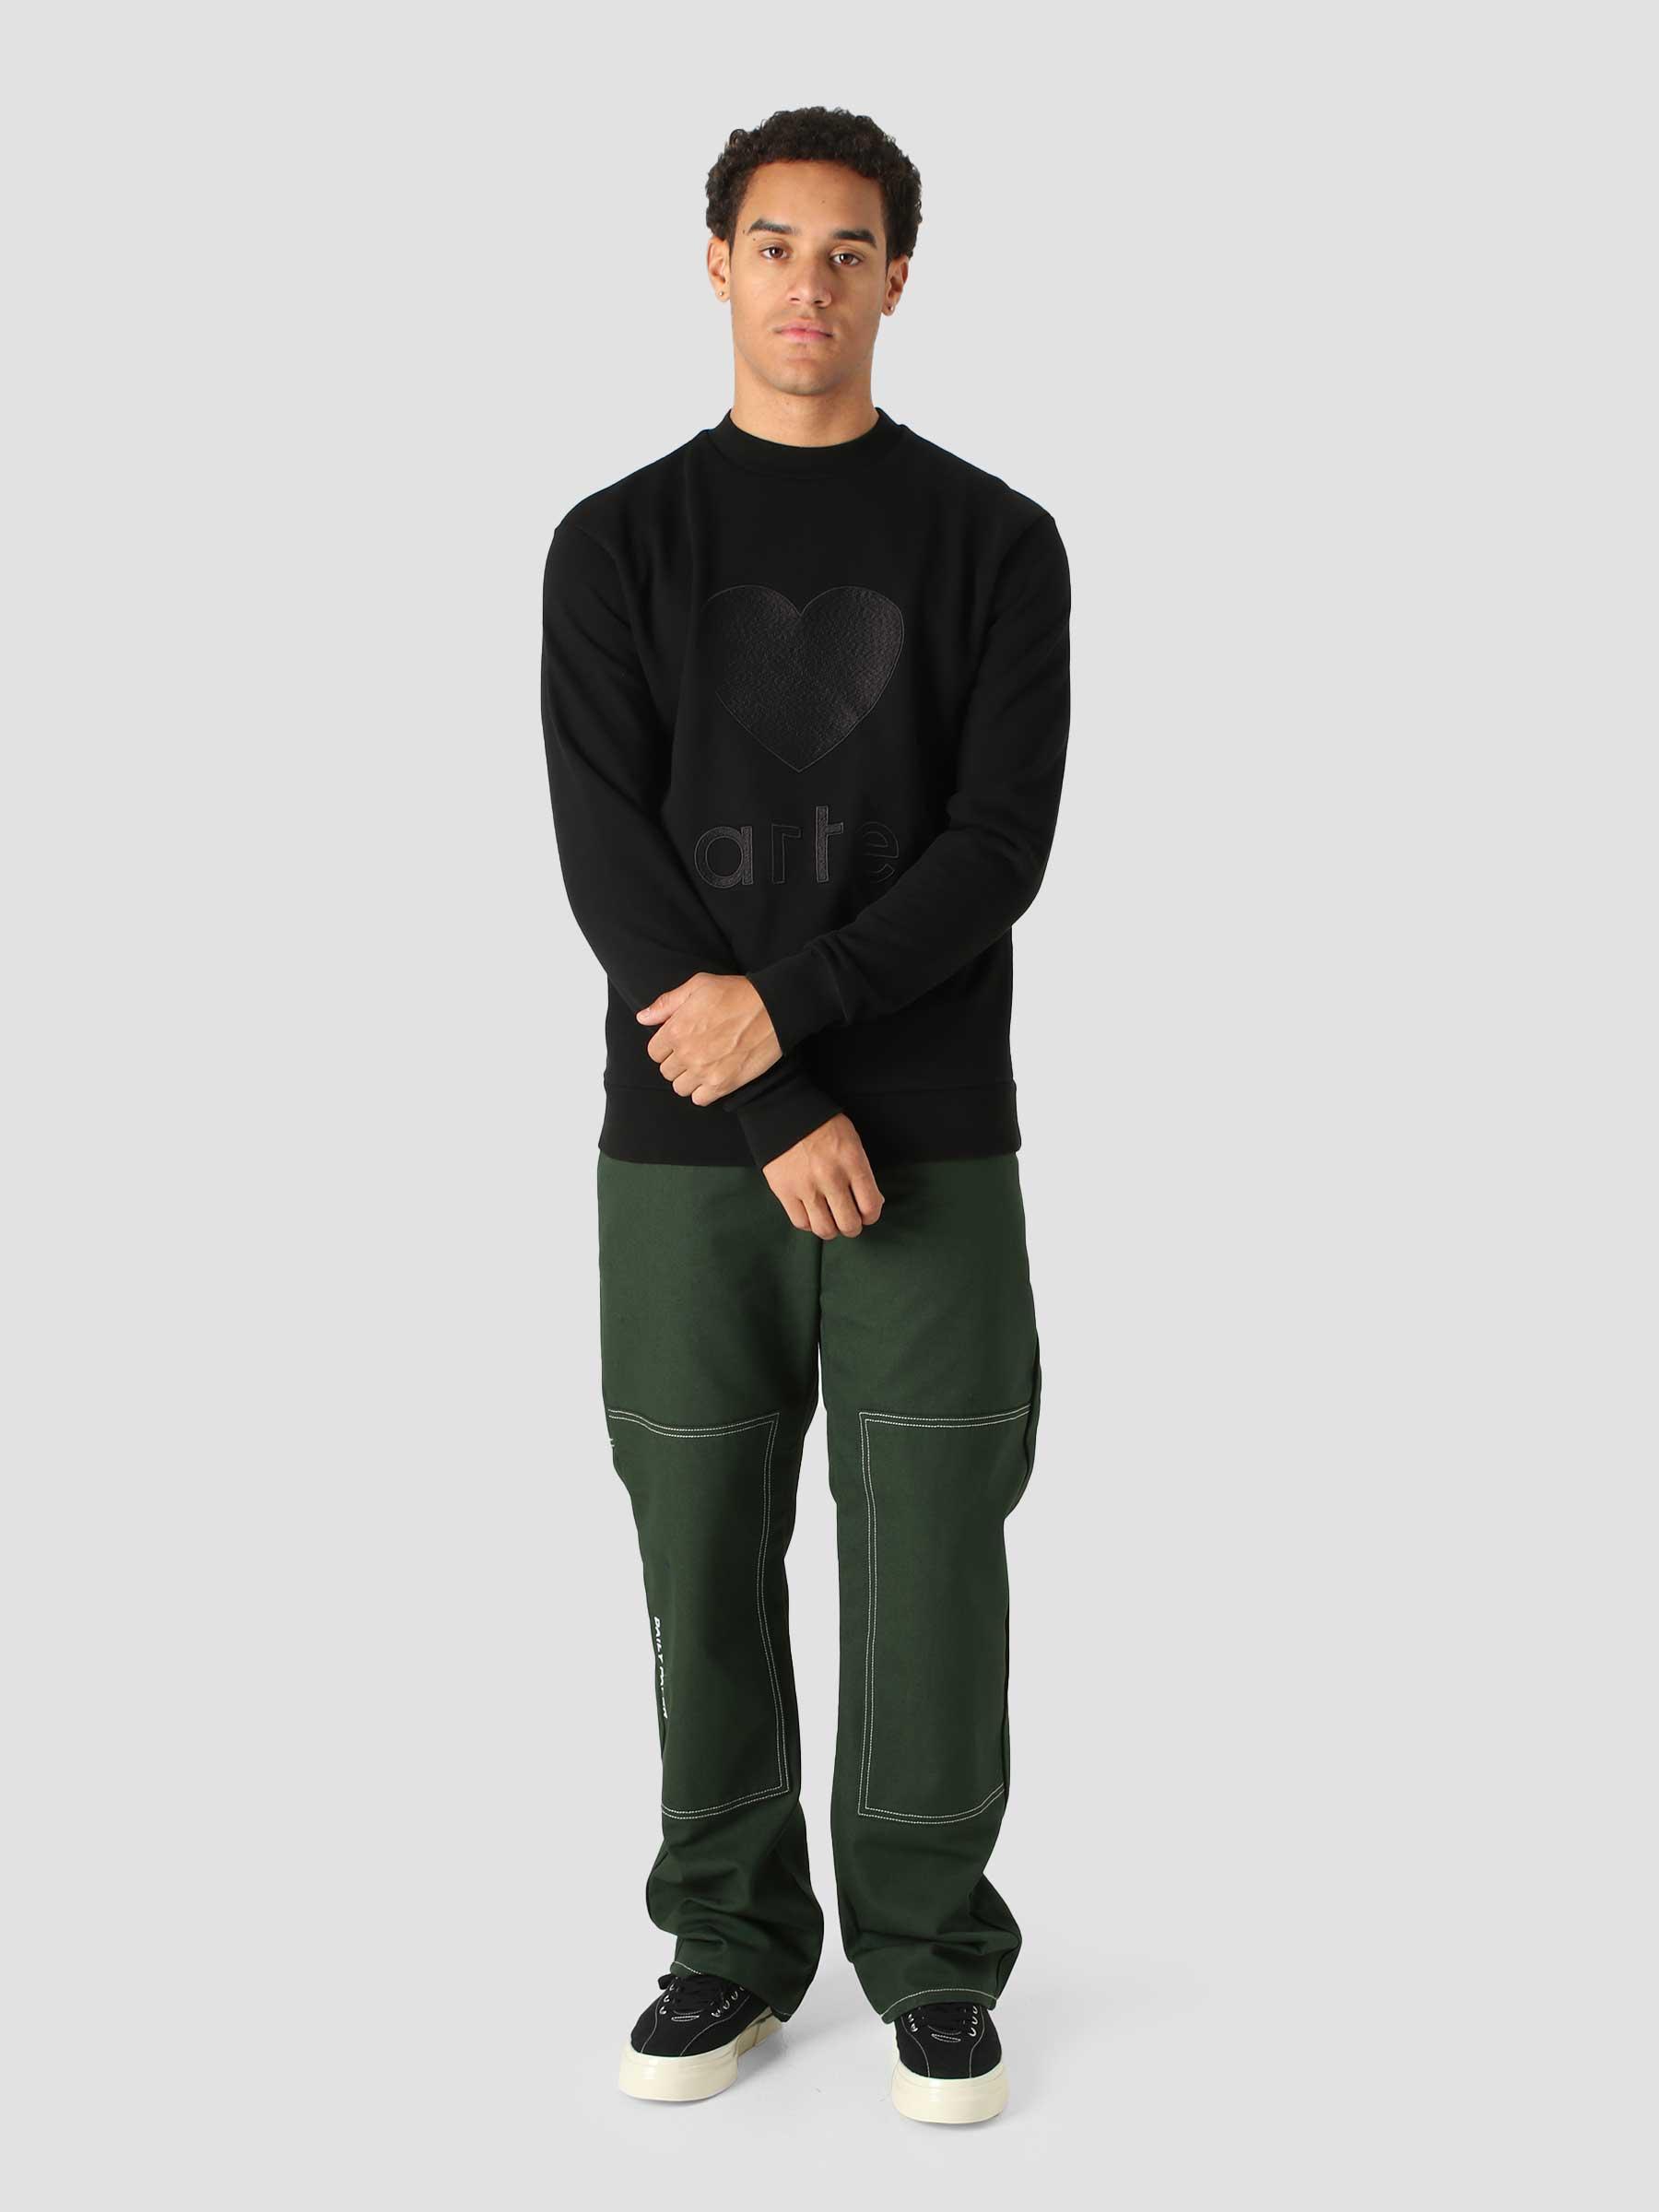 Castel Sweater Black AW21-090C